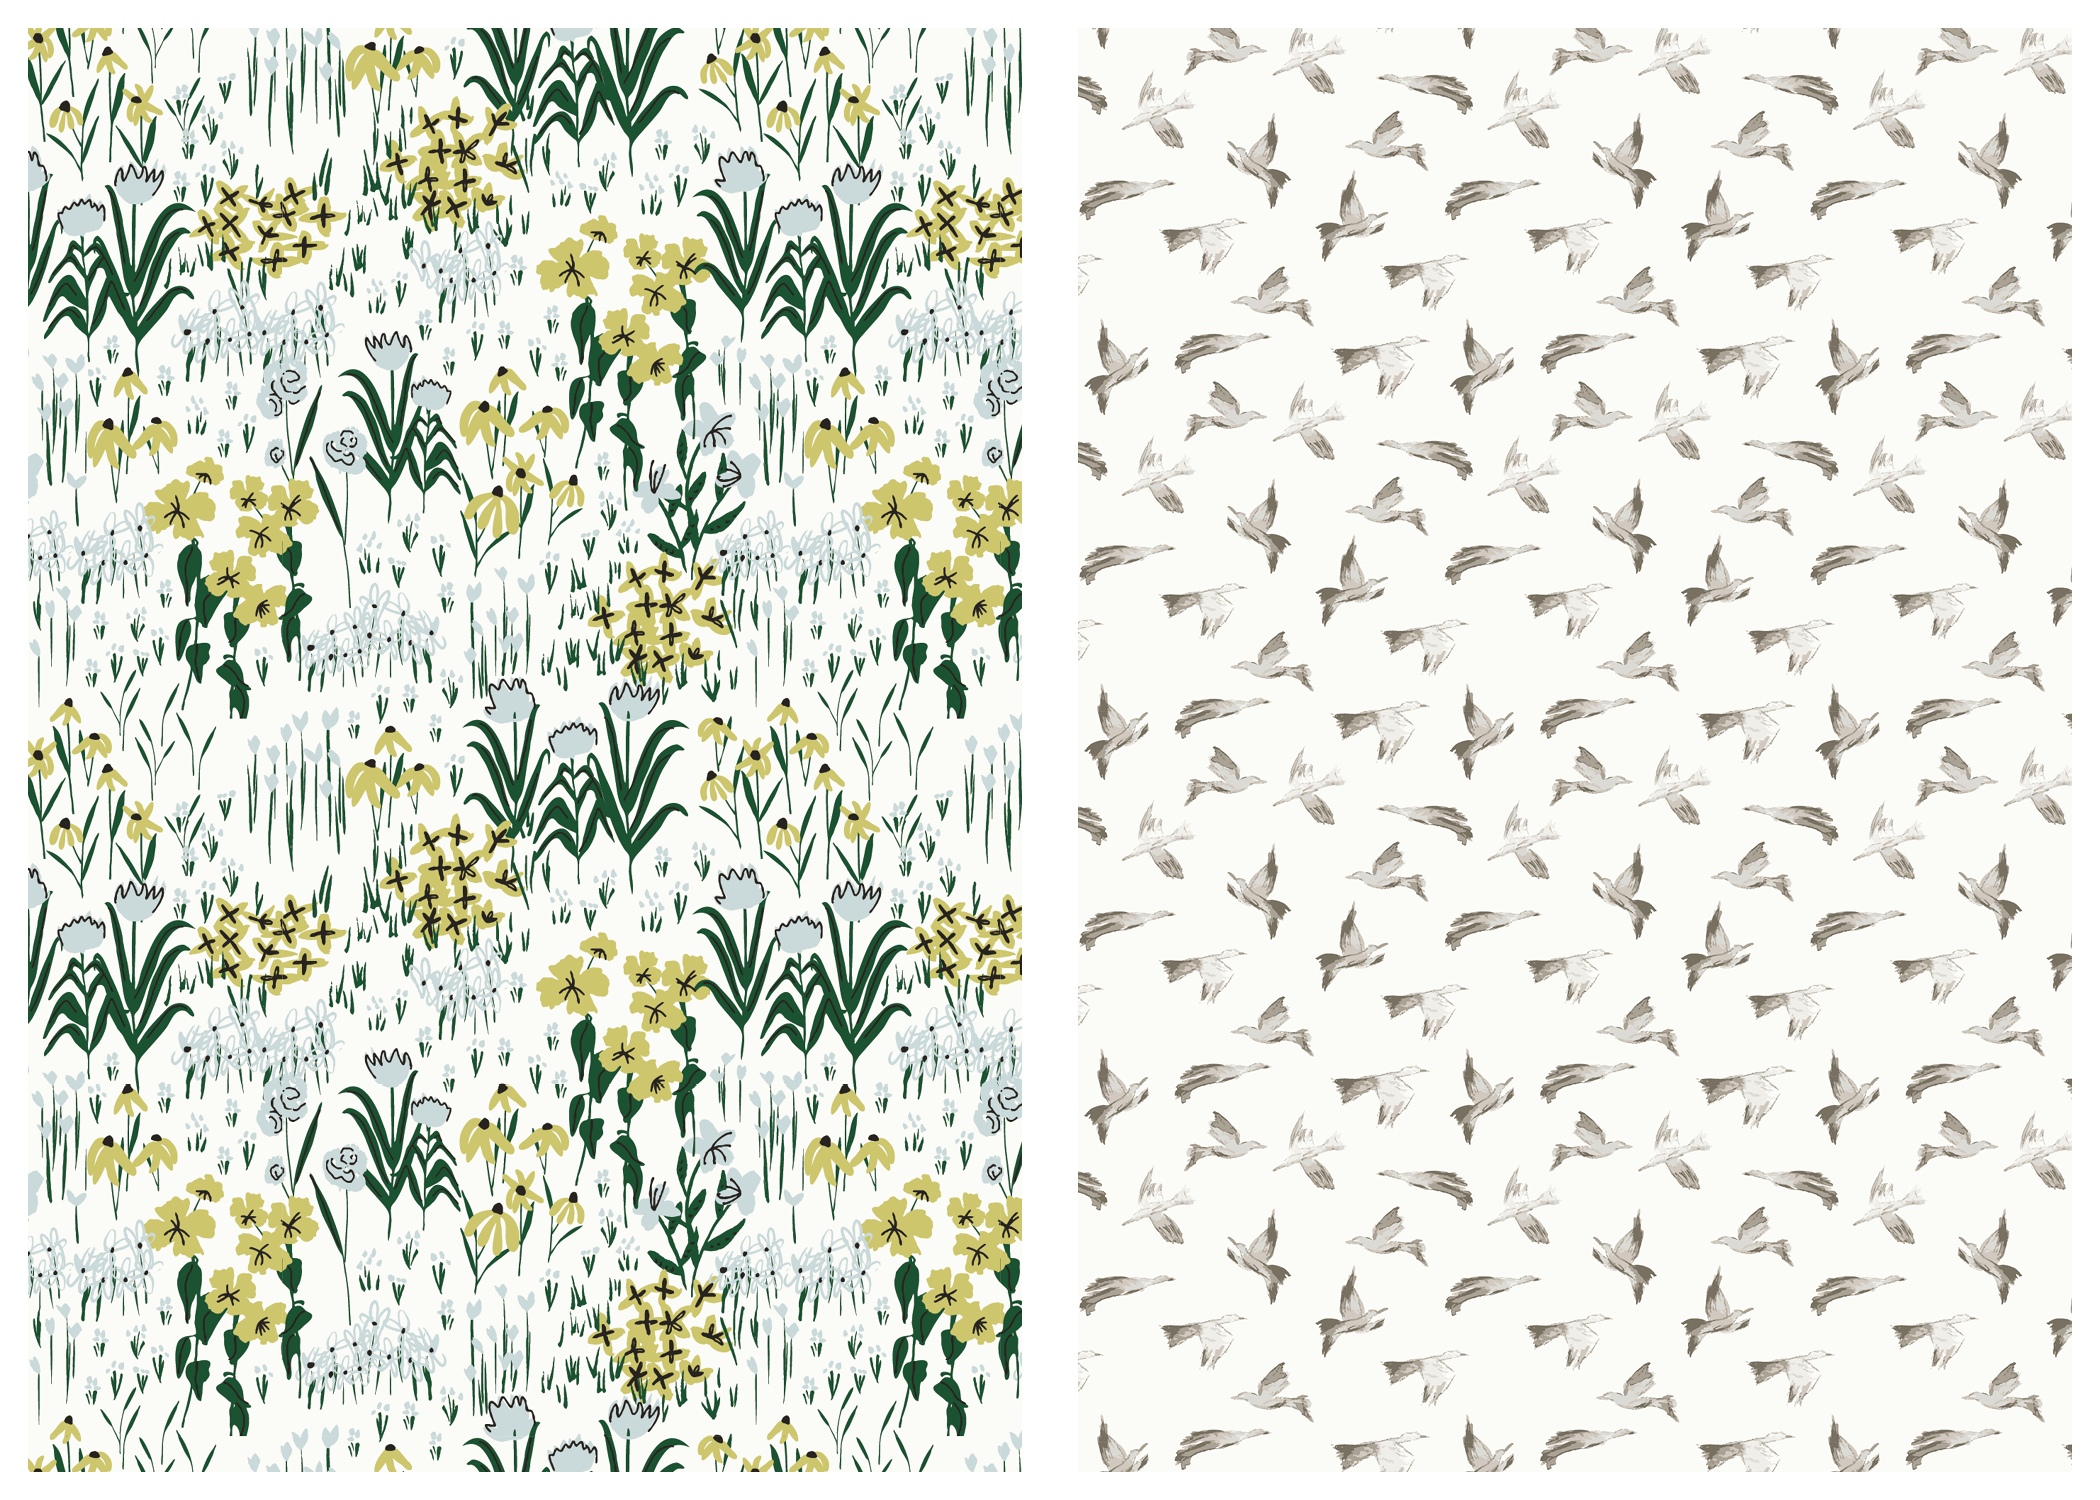 surface pattern design by HOPE johnson176.jpg